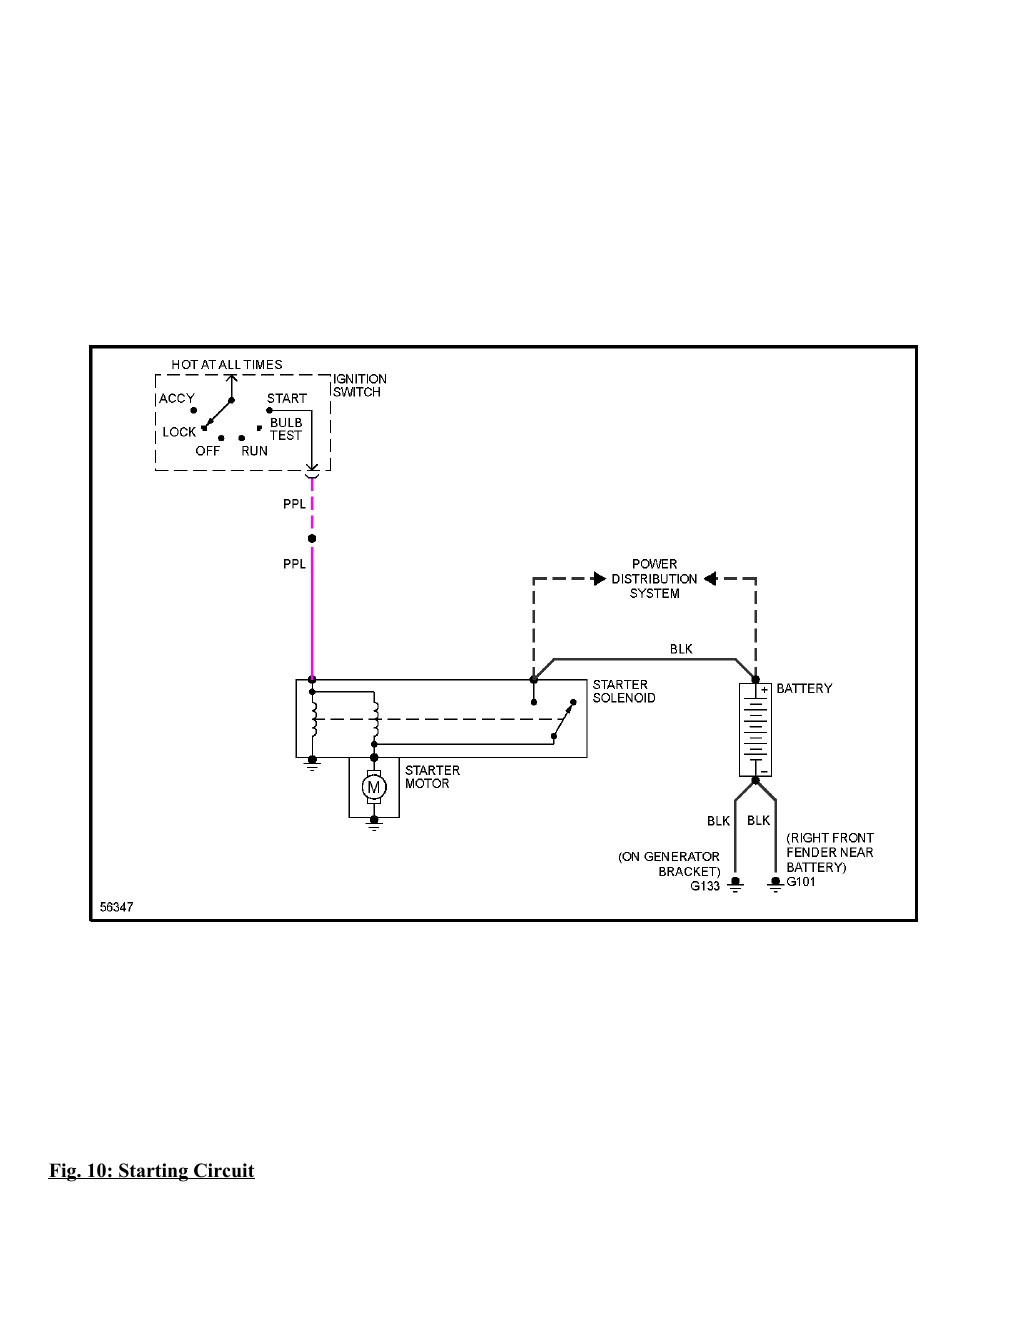 2001 monte carlo wiring diagram also 2000 monte carlo wiring diagram 2001 chevy monte carlo engine  [ 1020 x 1320 Pixel ]